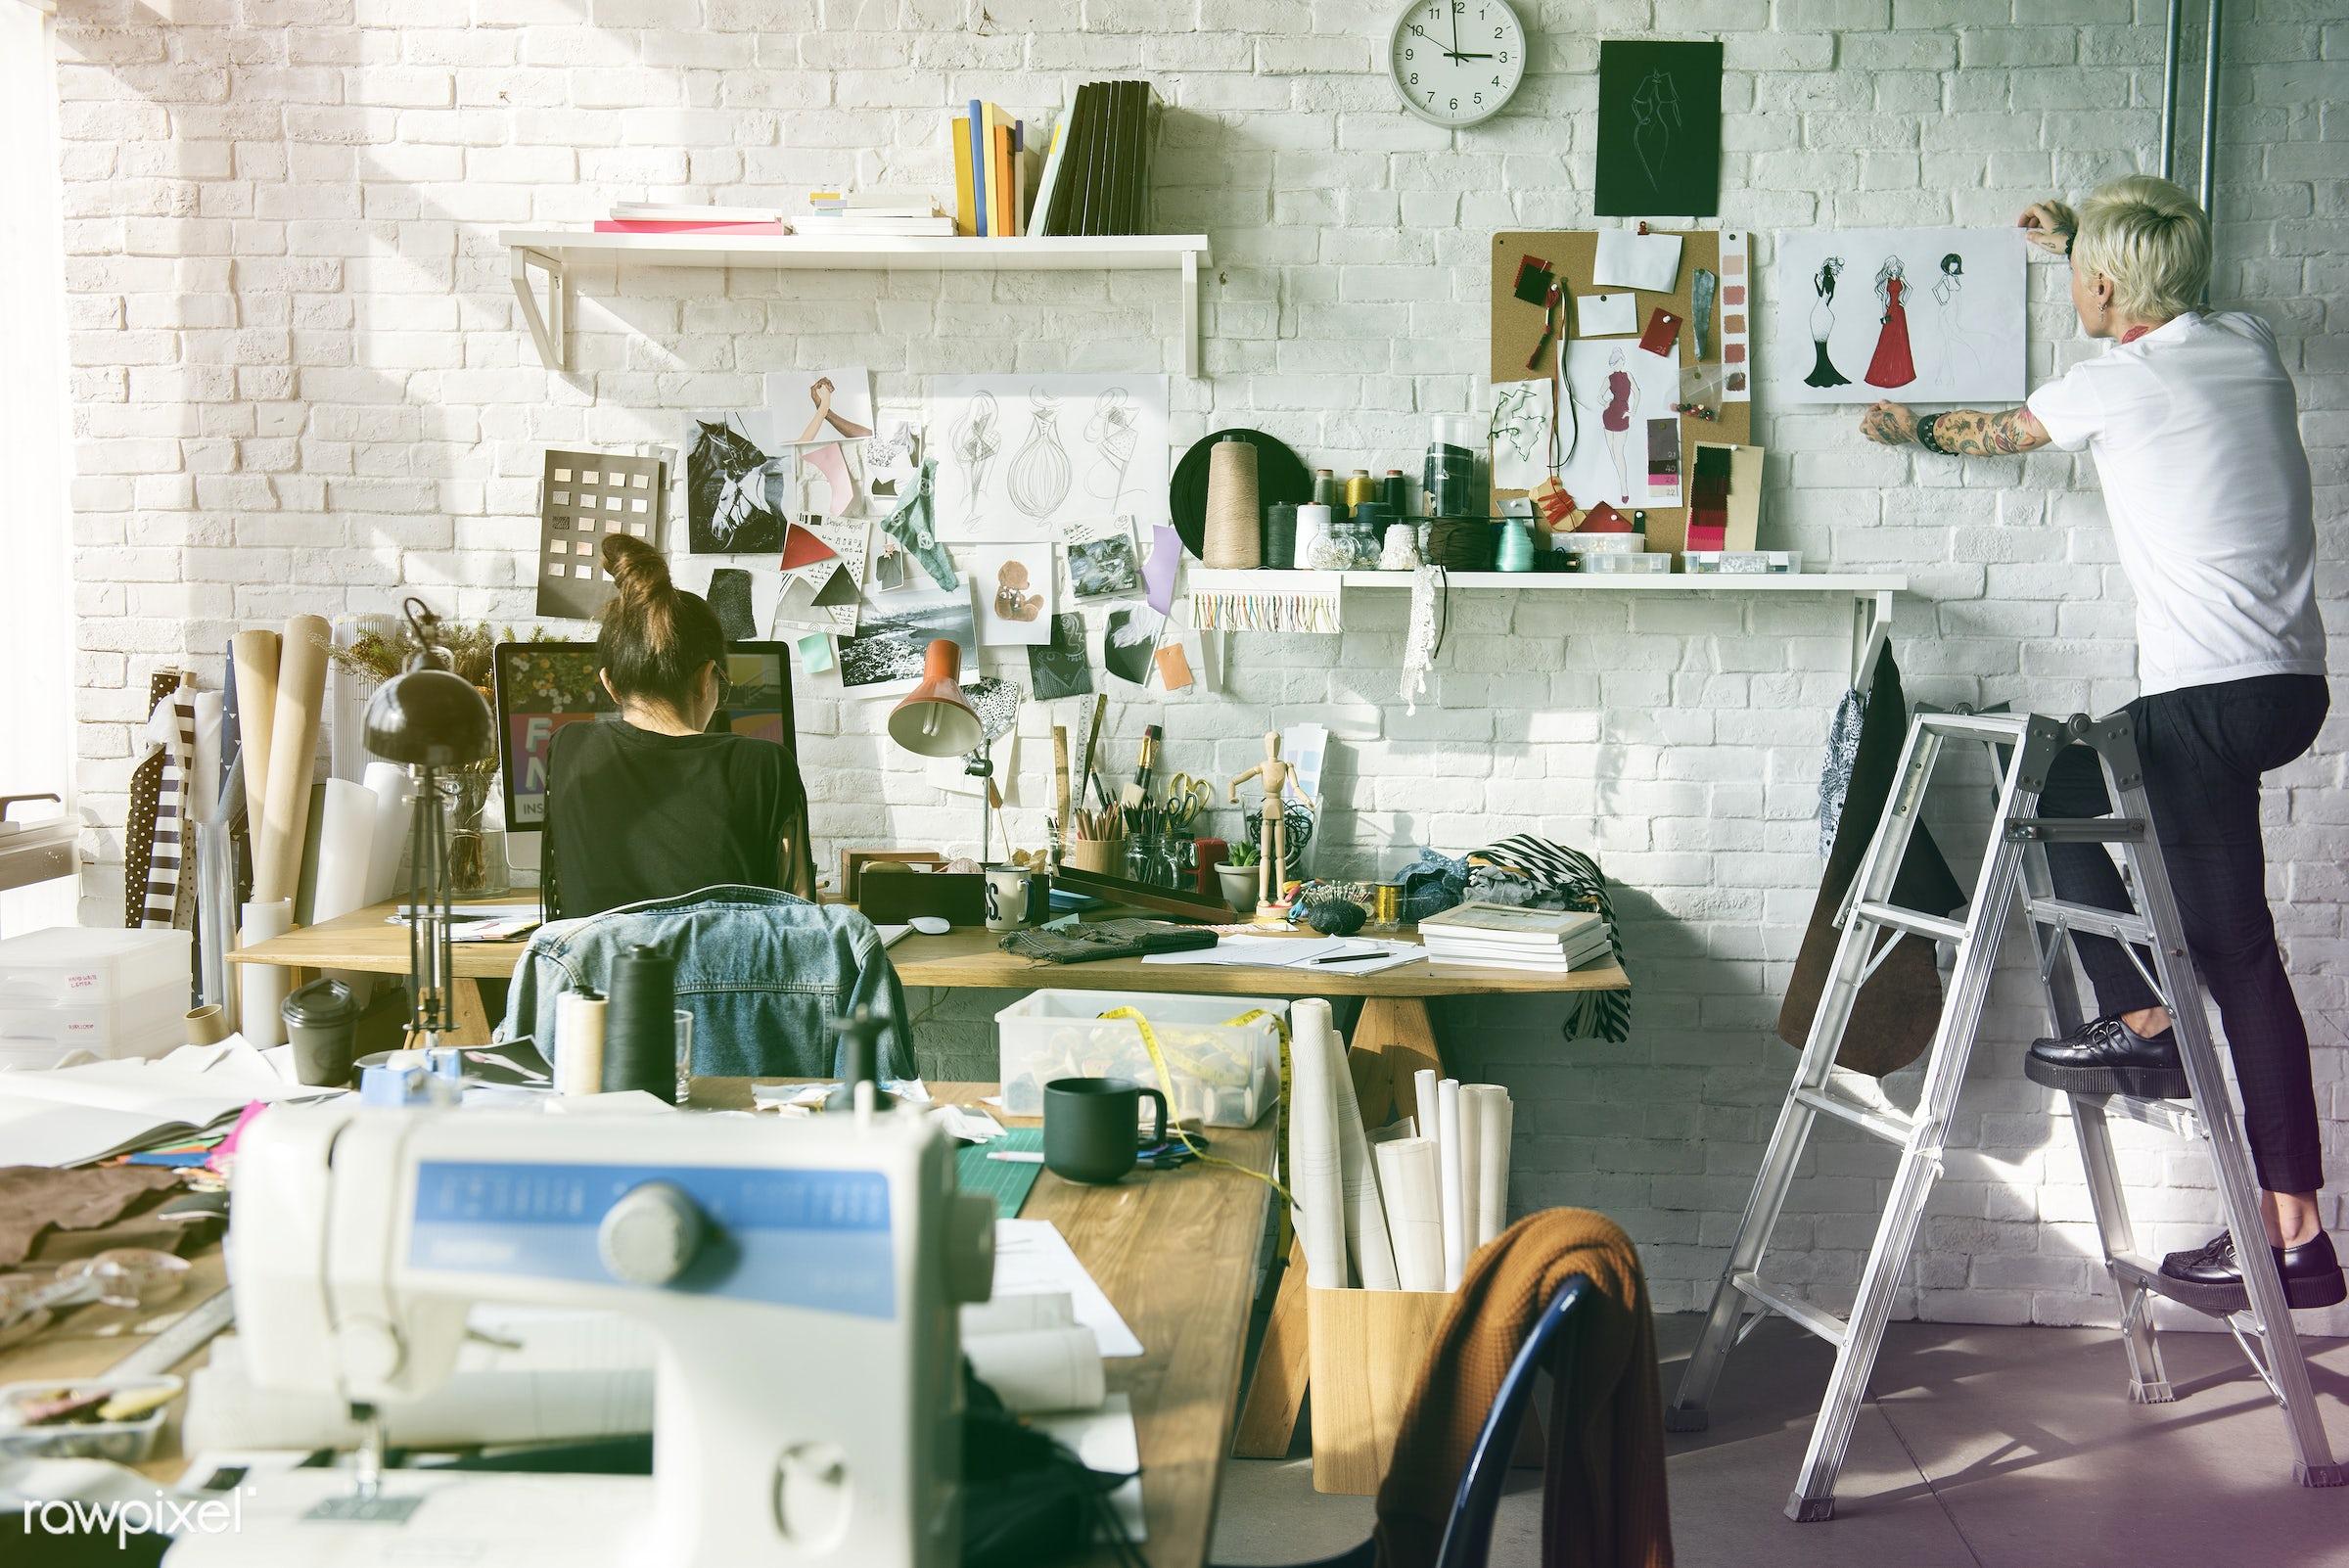 trends, sew, fashion, detail, craft, sketchboard, clothing, reminder board, sketchpad, garment, pasting, fashion studio,...